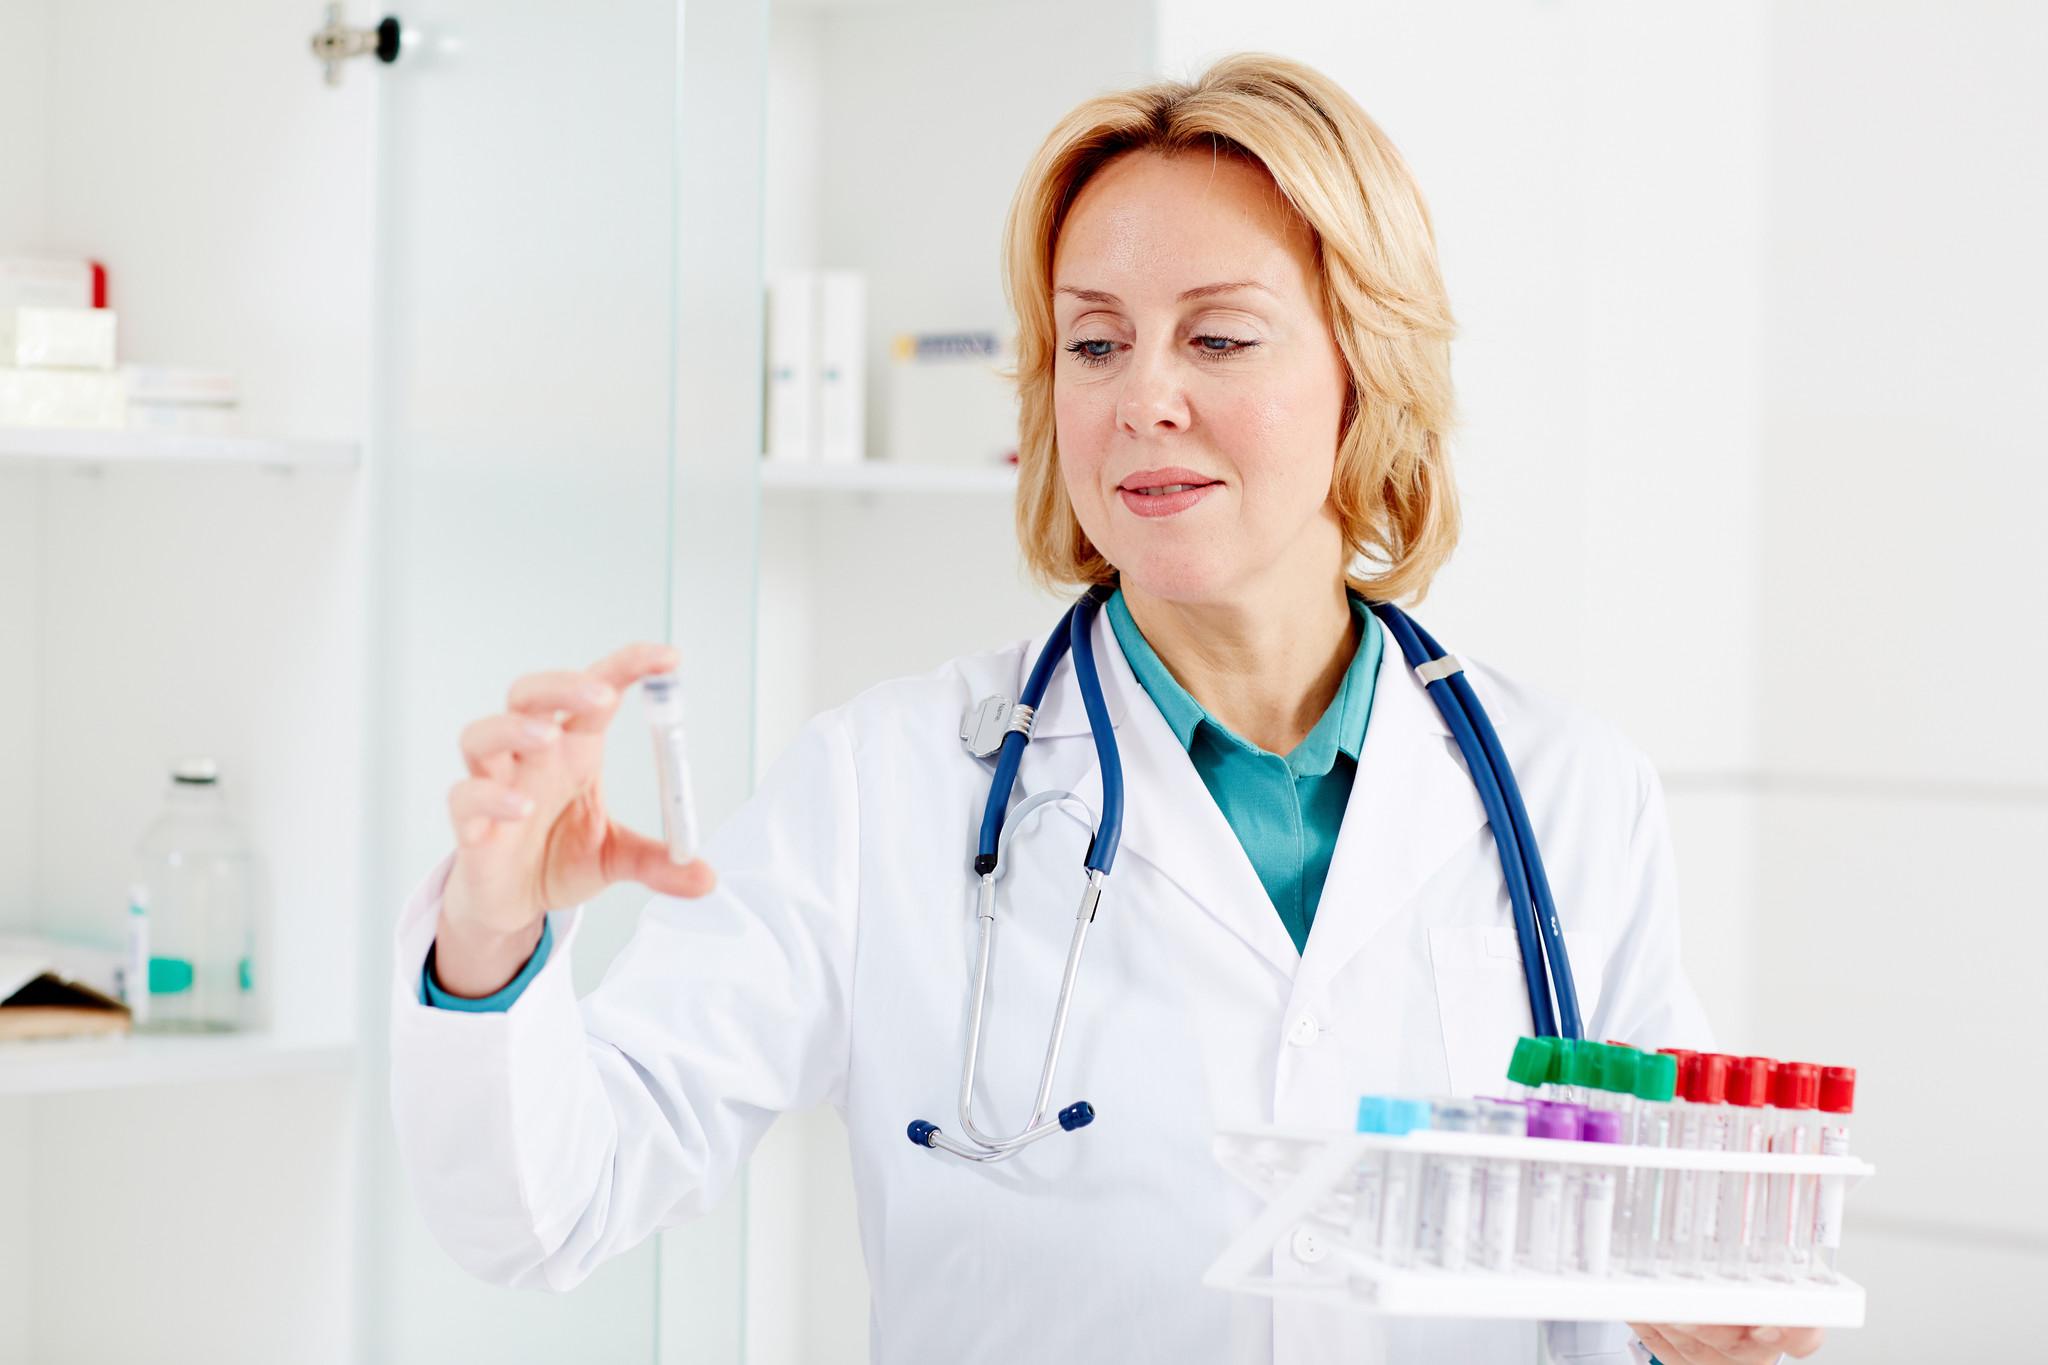 Medikamentenkühlschrank DIN 58345 Fernalarm Alarmweiterleitung potentialfreier Kontakt